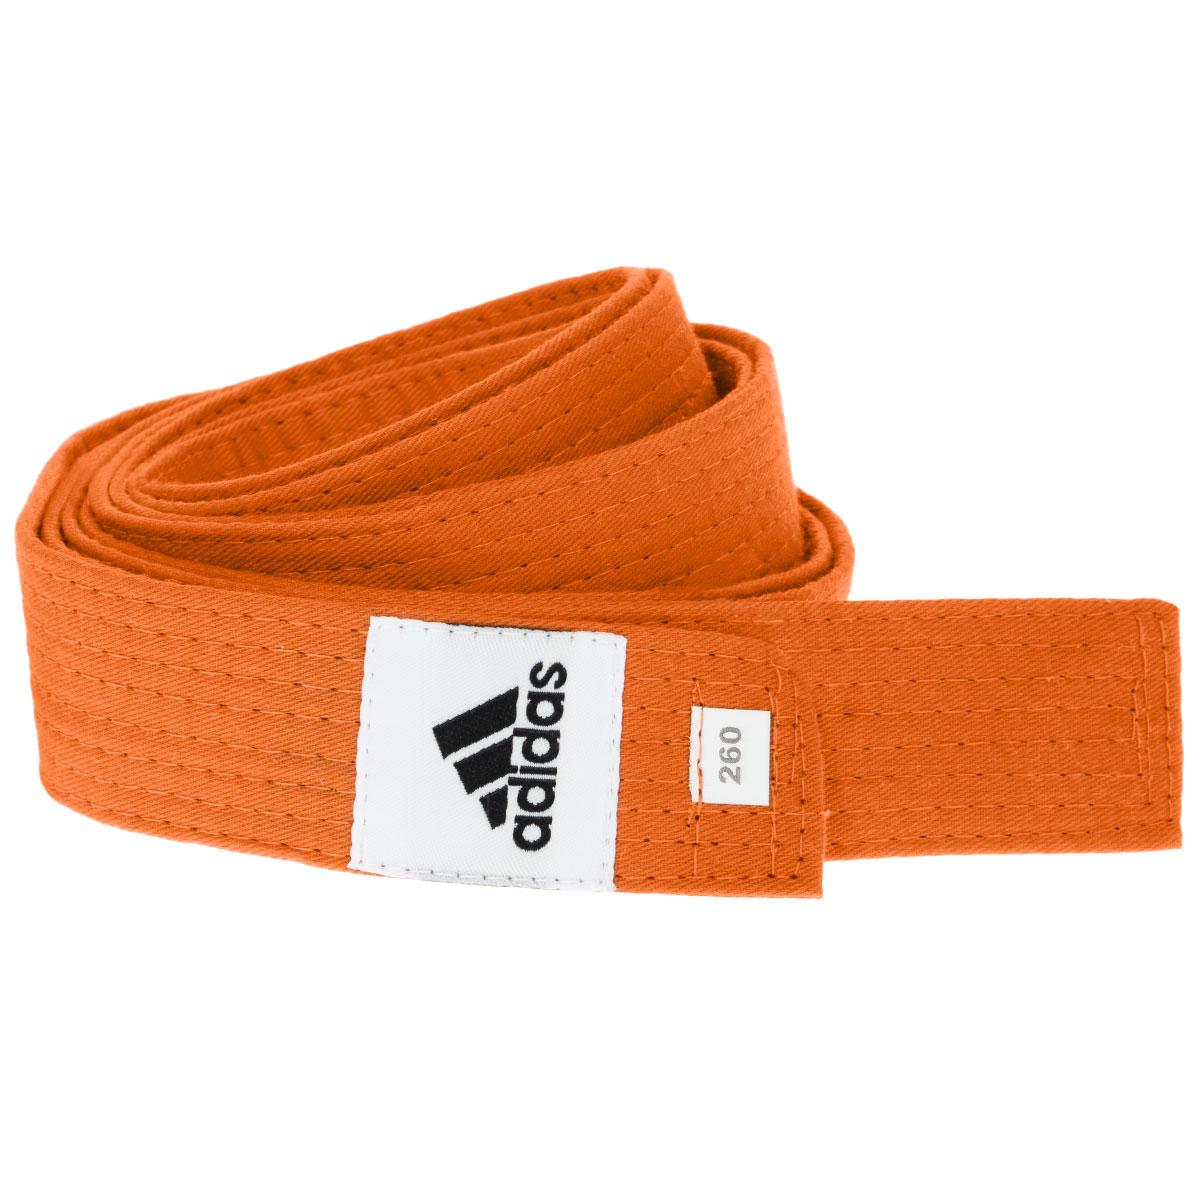 Пояс для единоборств adidas Club, цвет: оранжевый. adiB220. Длина 300 см [zob] new original switching power supply s82k 05024 s8vs 06024